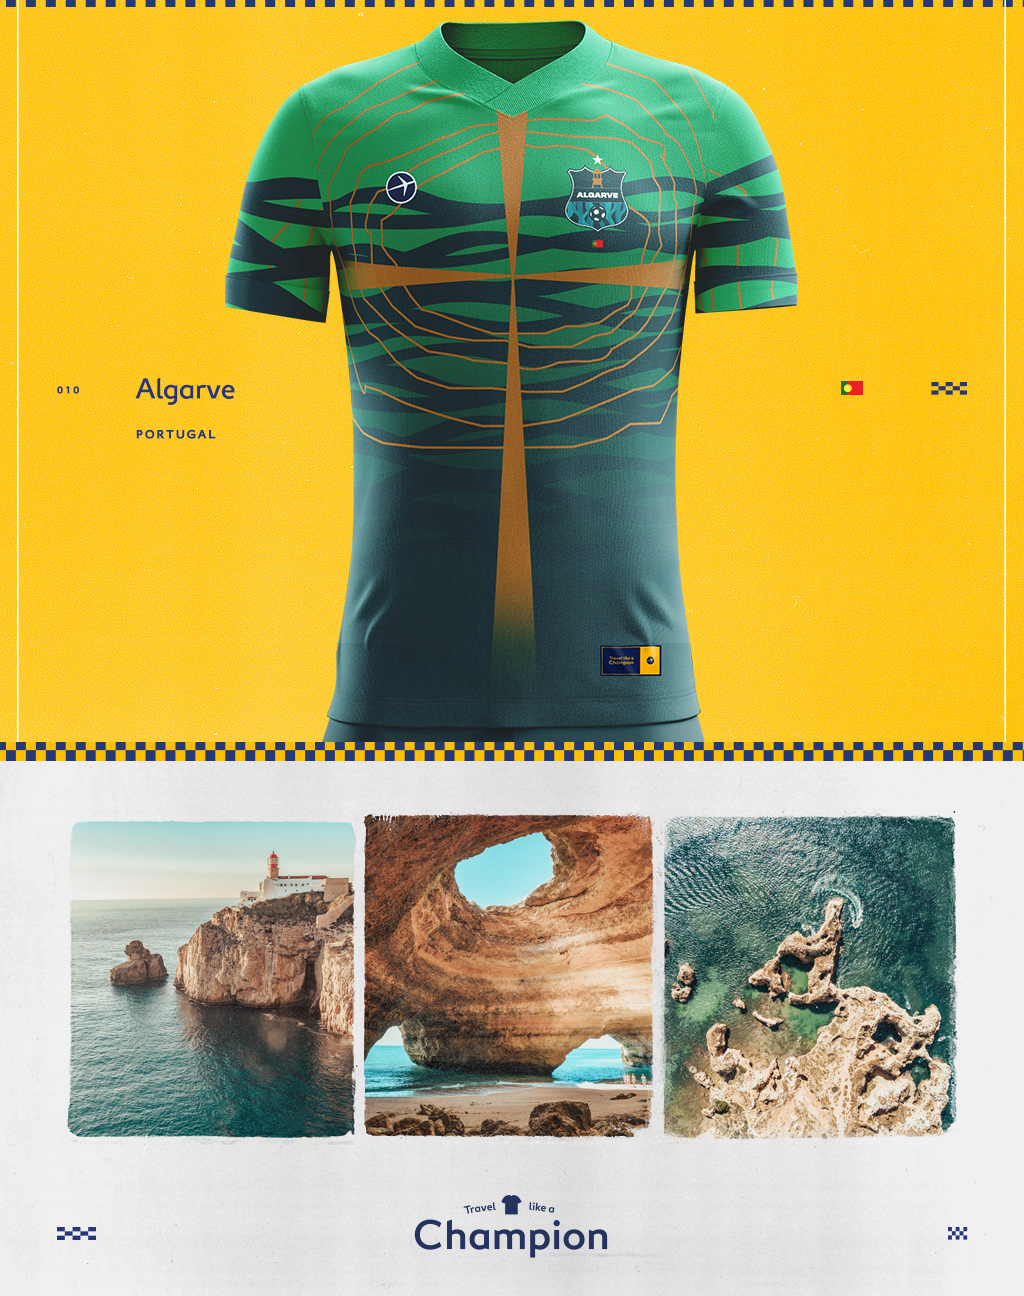 algarve portugal inspired a soccer jersey design